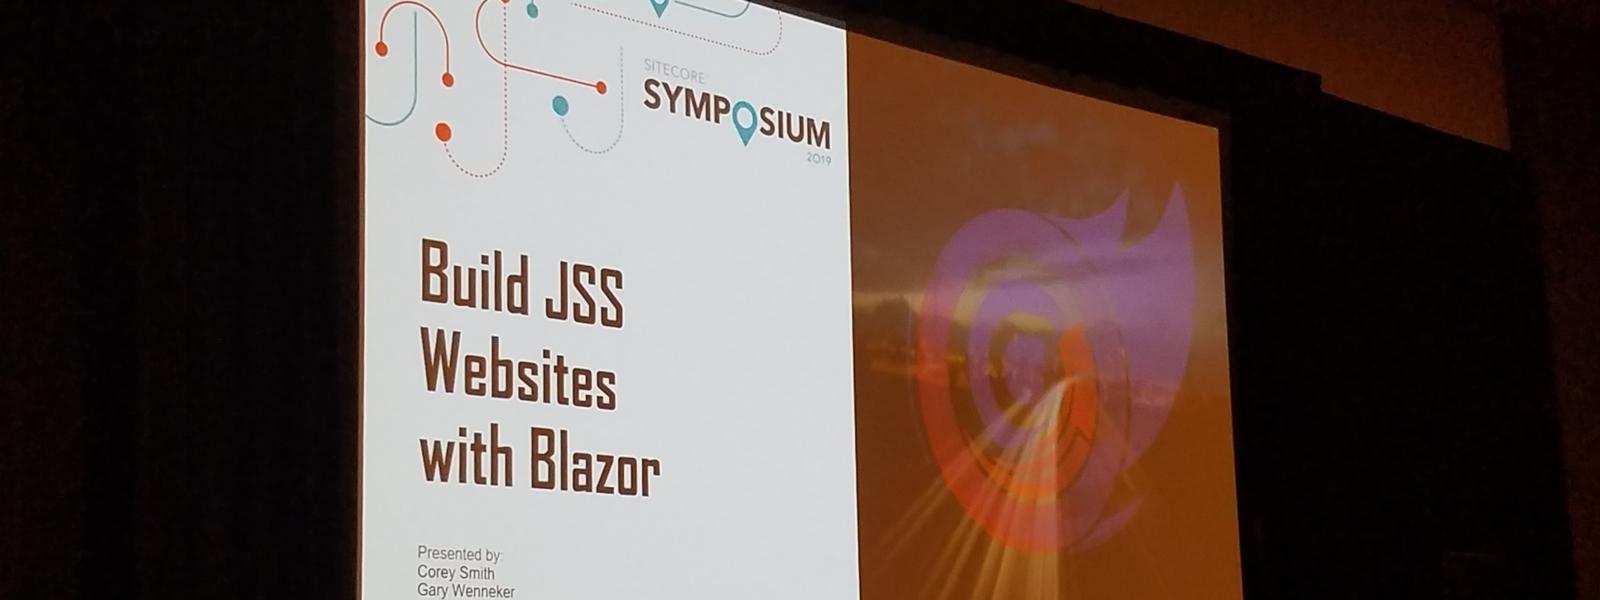 Sitecore Symposium JSS Session